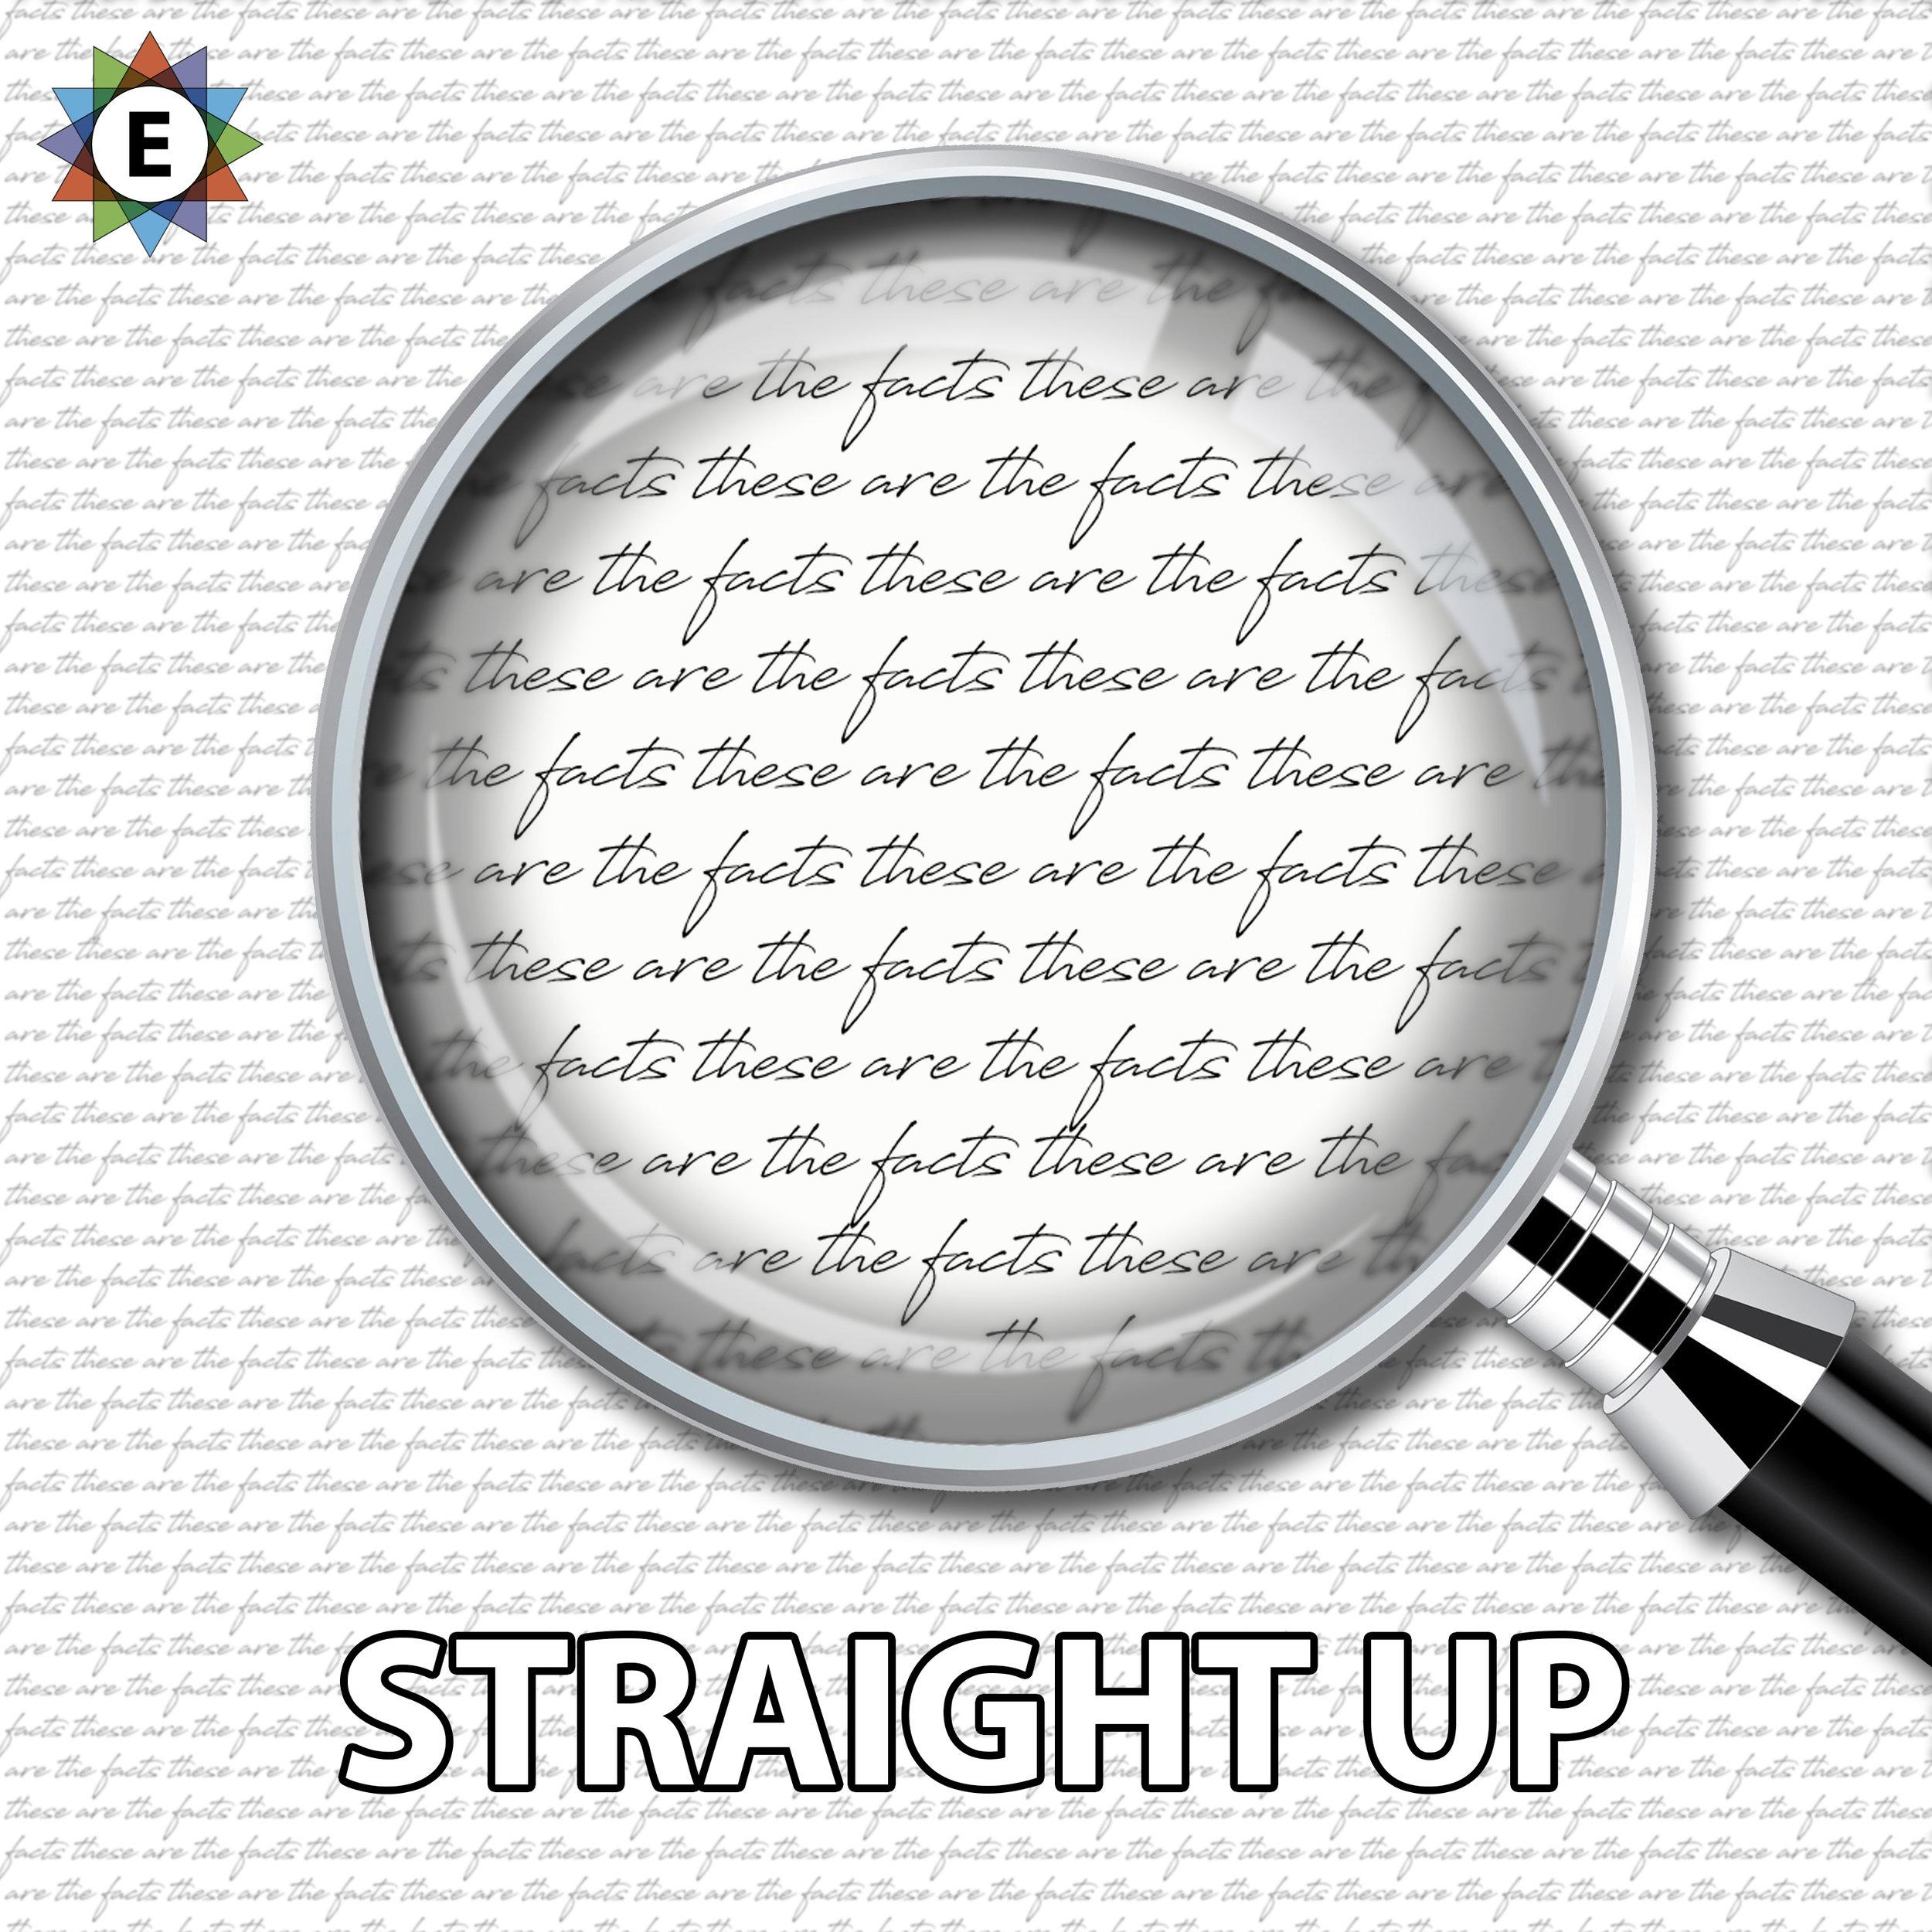 StraightUp2.jpg